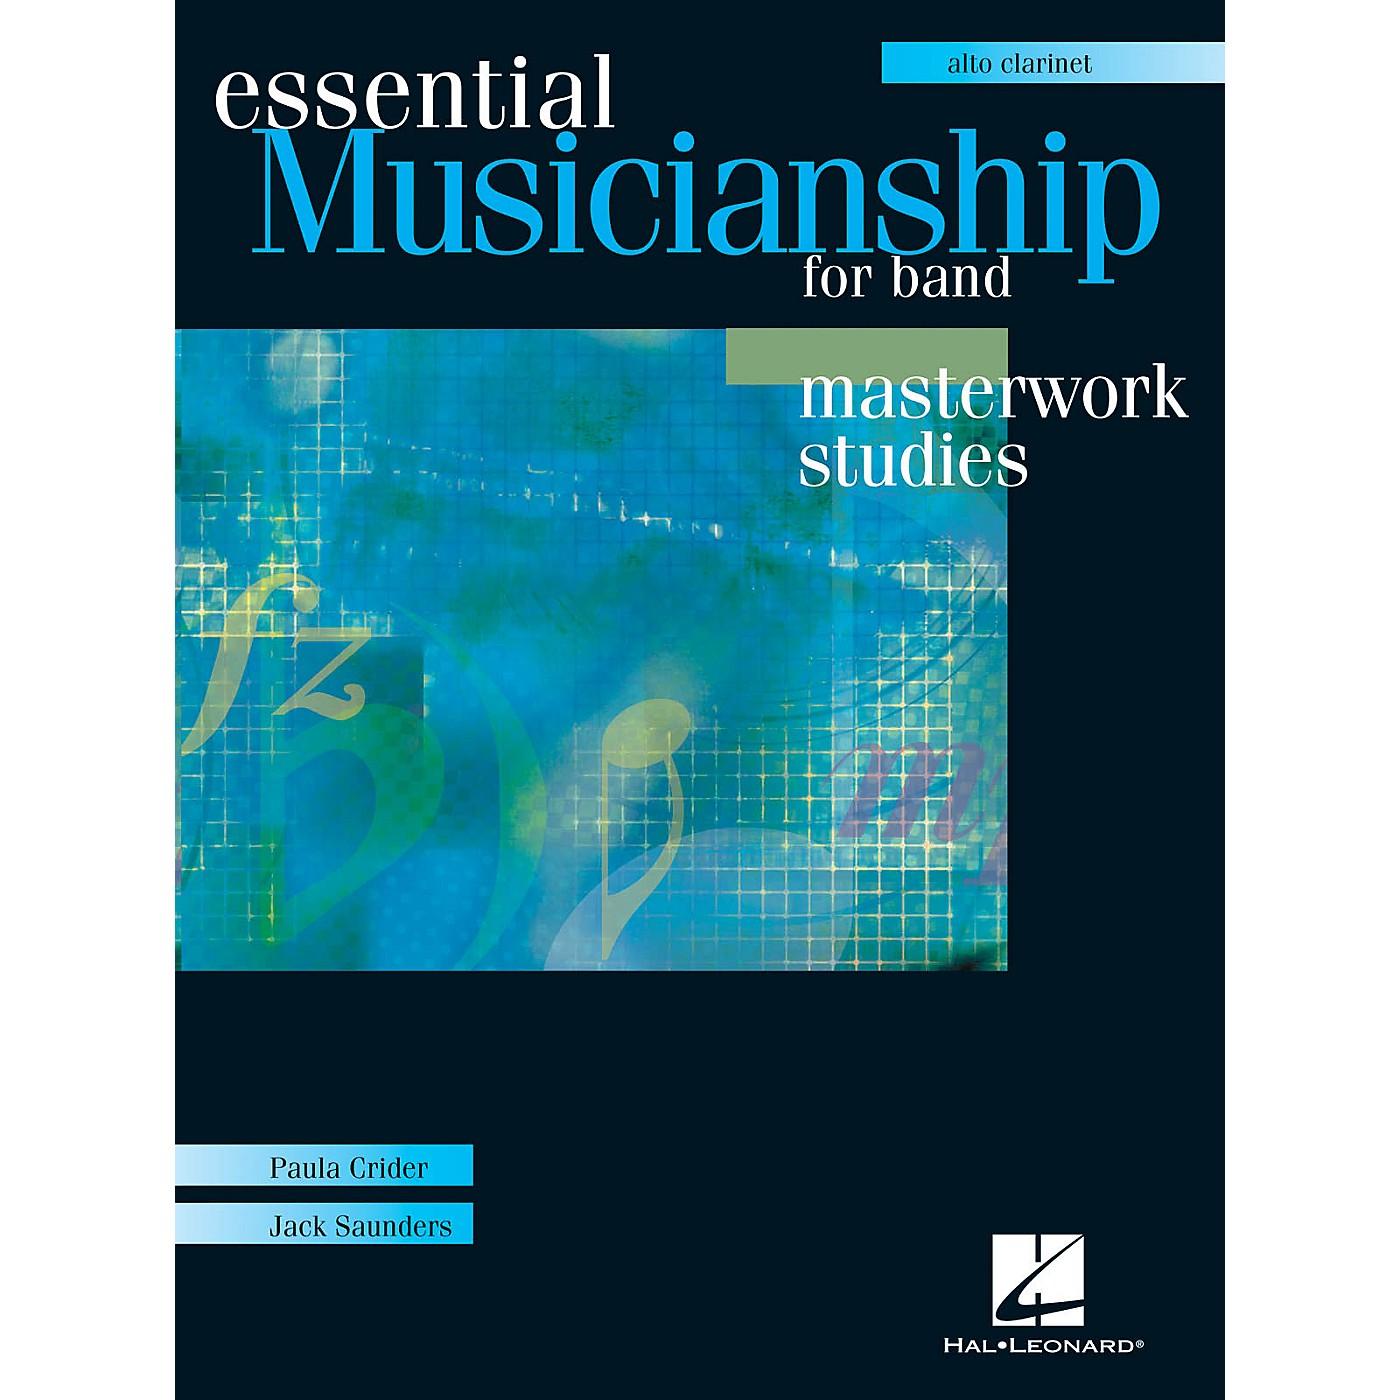 Hal Leonard Essential Musicianship for Band - Masterwork Studies (Alto Clarinet) Concert Band thumbnail